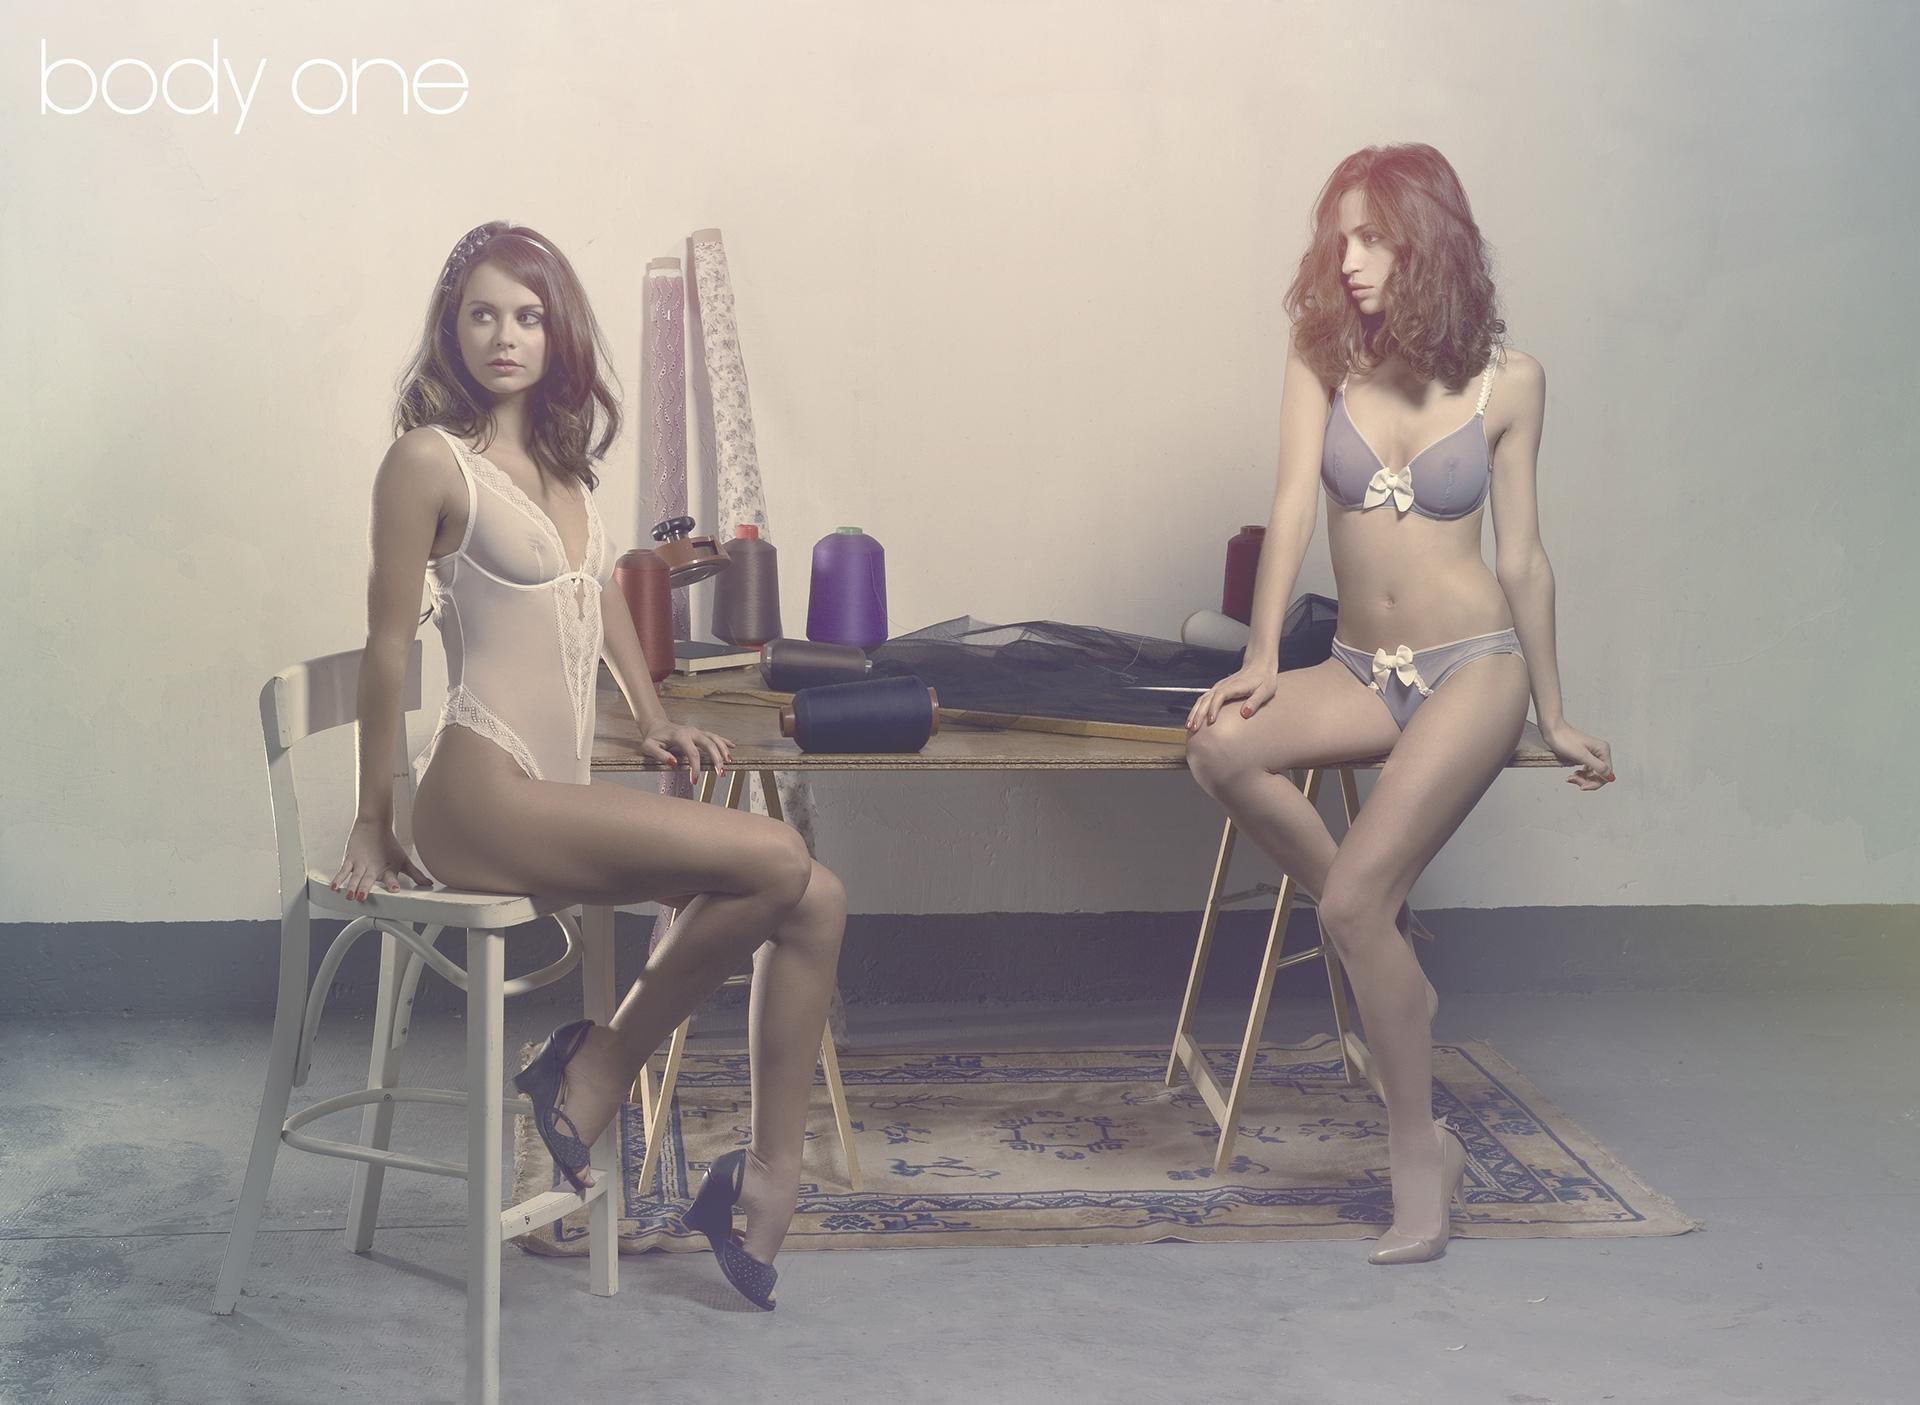 body one campaign 2009 2010 lingerie underwear frederic mercier fashion photographer one color